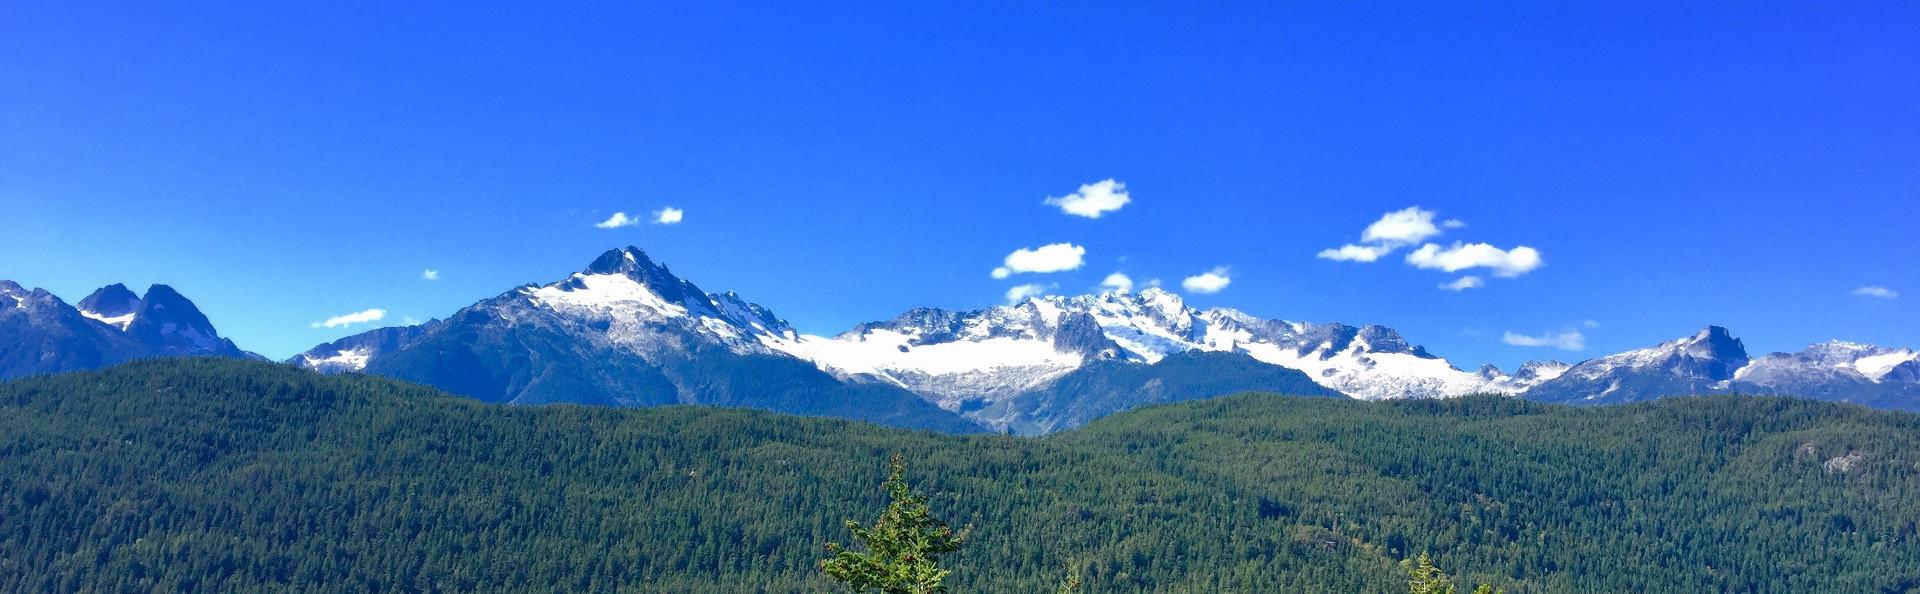 Rocky-Mountain-School-District-Scenic-Mountain-Range